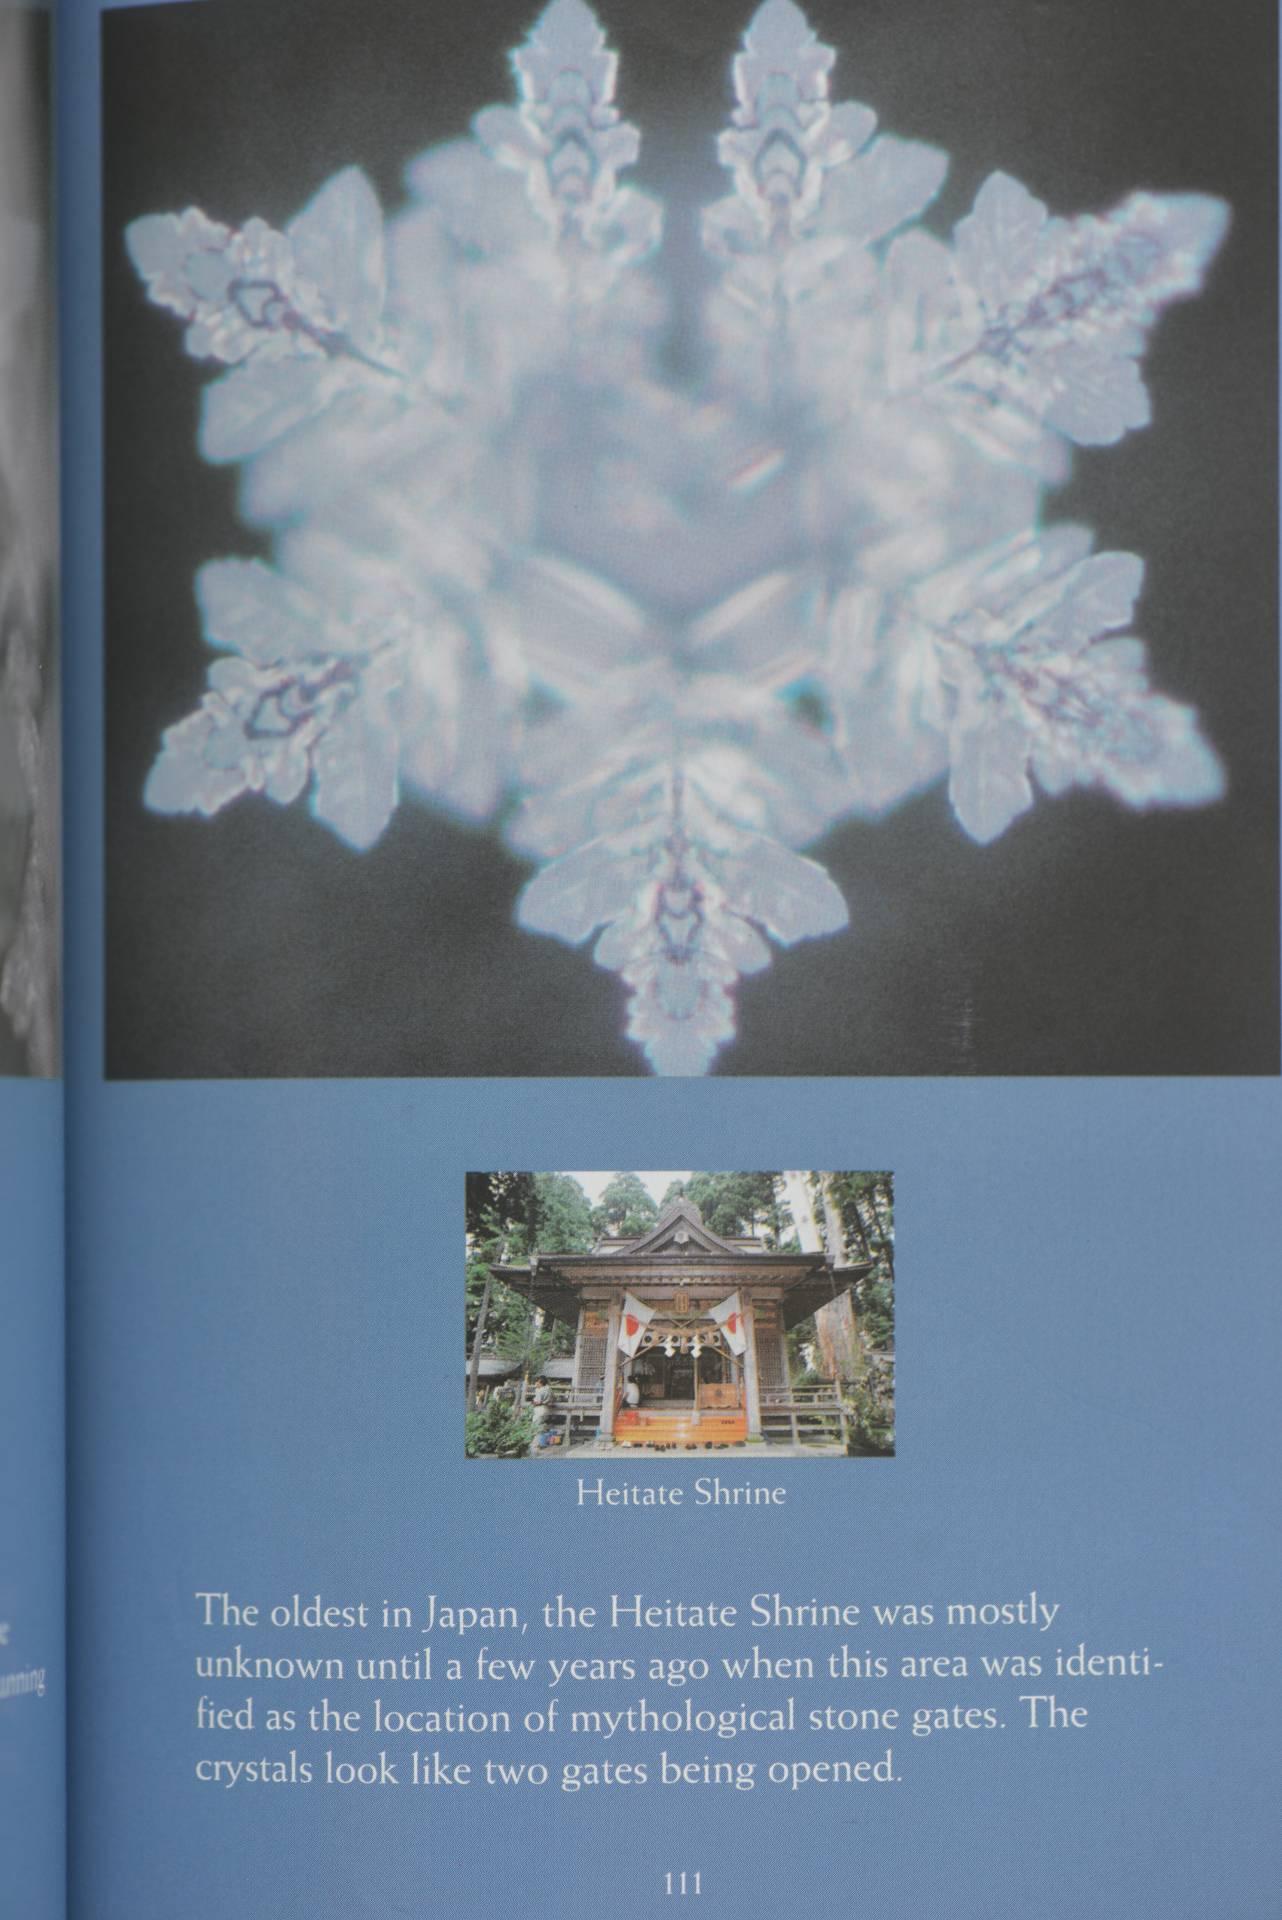 Photo 5. Photo Heitate Shrine and crystal